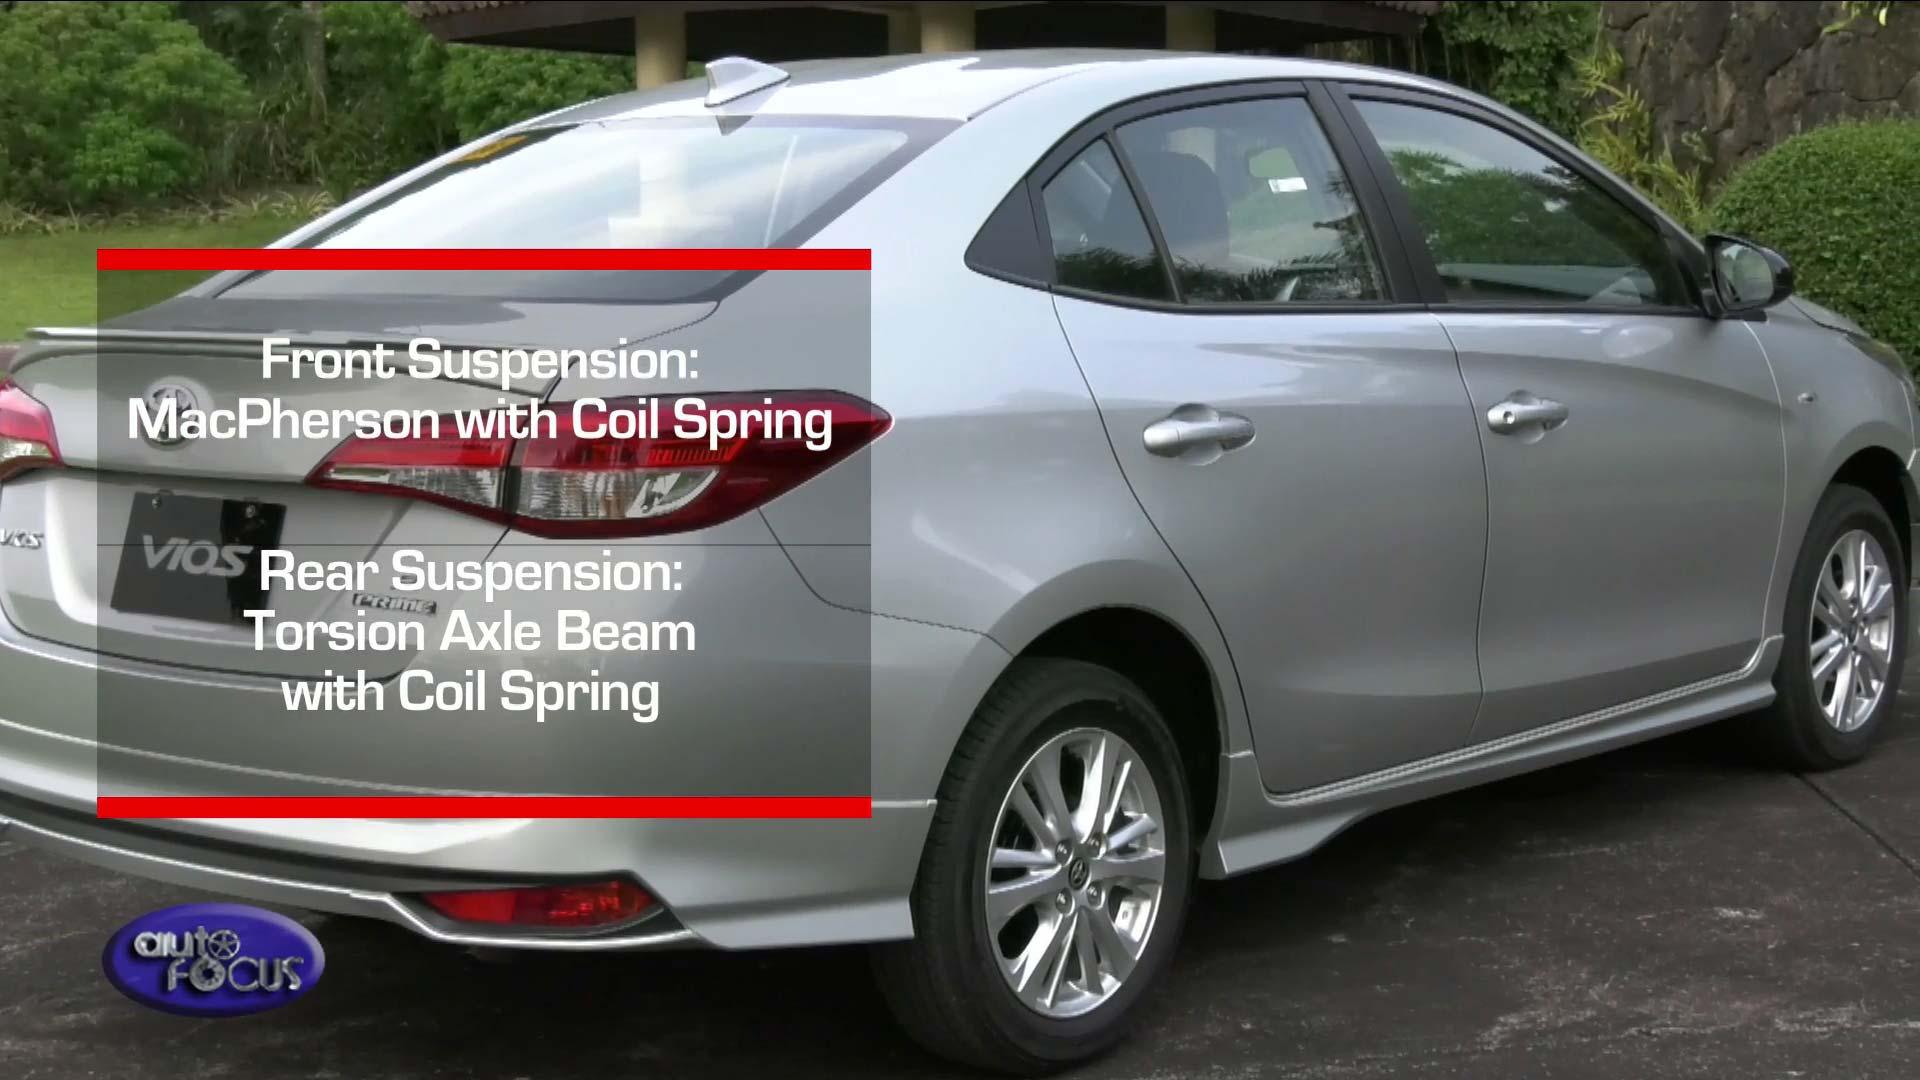 Production Models: 2019 Toyota Vios 1 3 E CVT Review - Auto